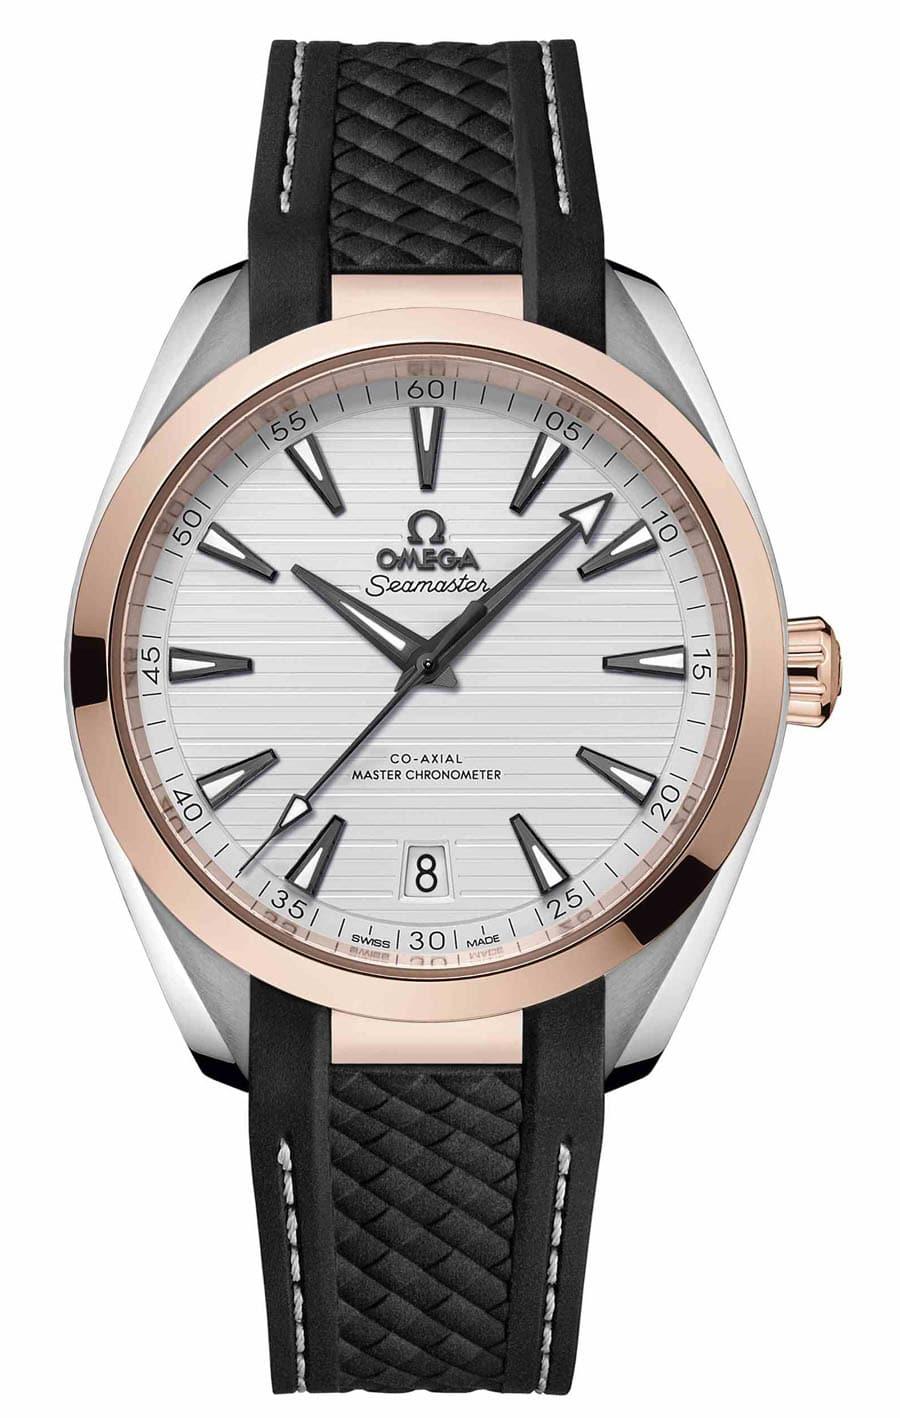 Omega: Seamaster Aqua Terra Master Chronometer in Edelstahl und Sedna-Gold